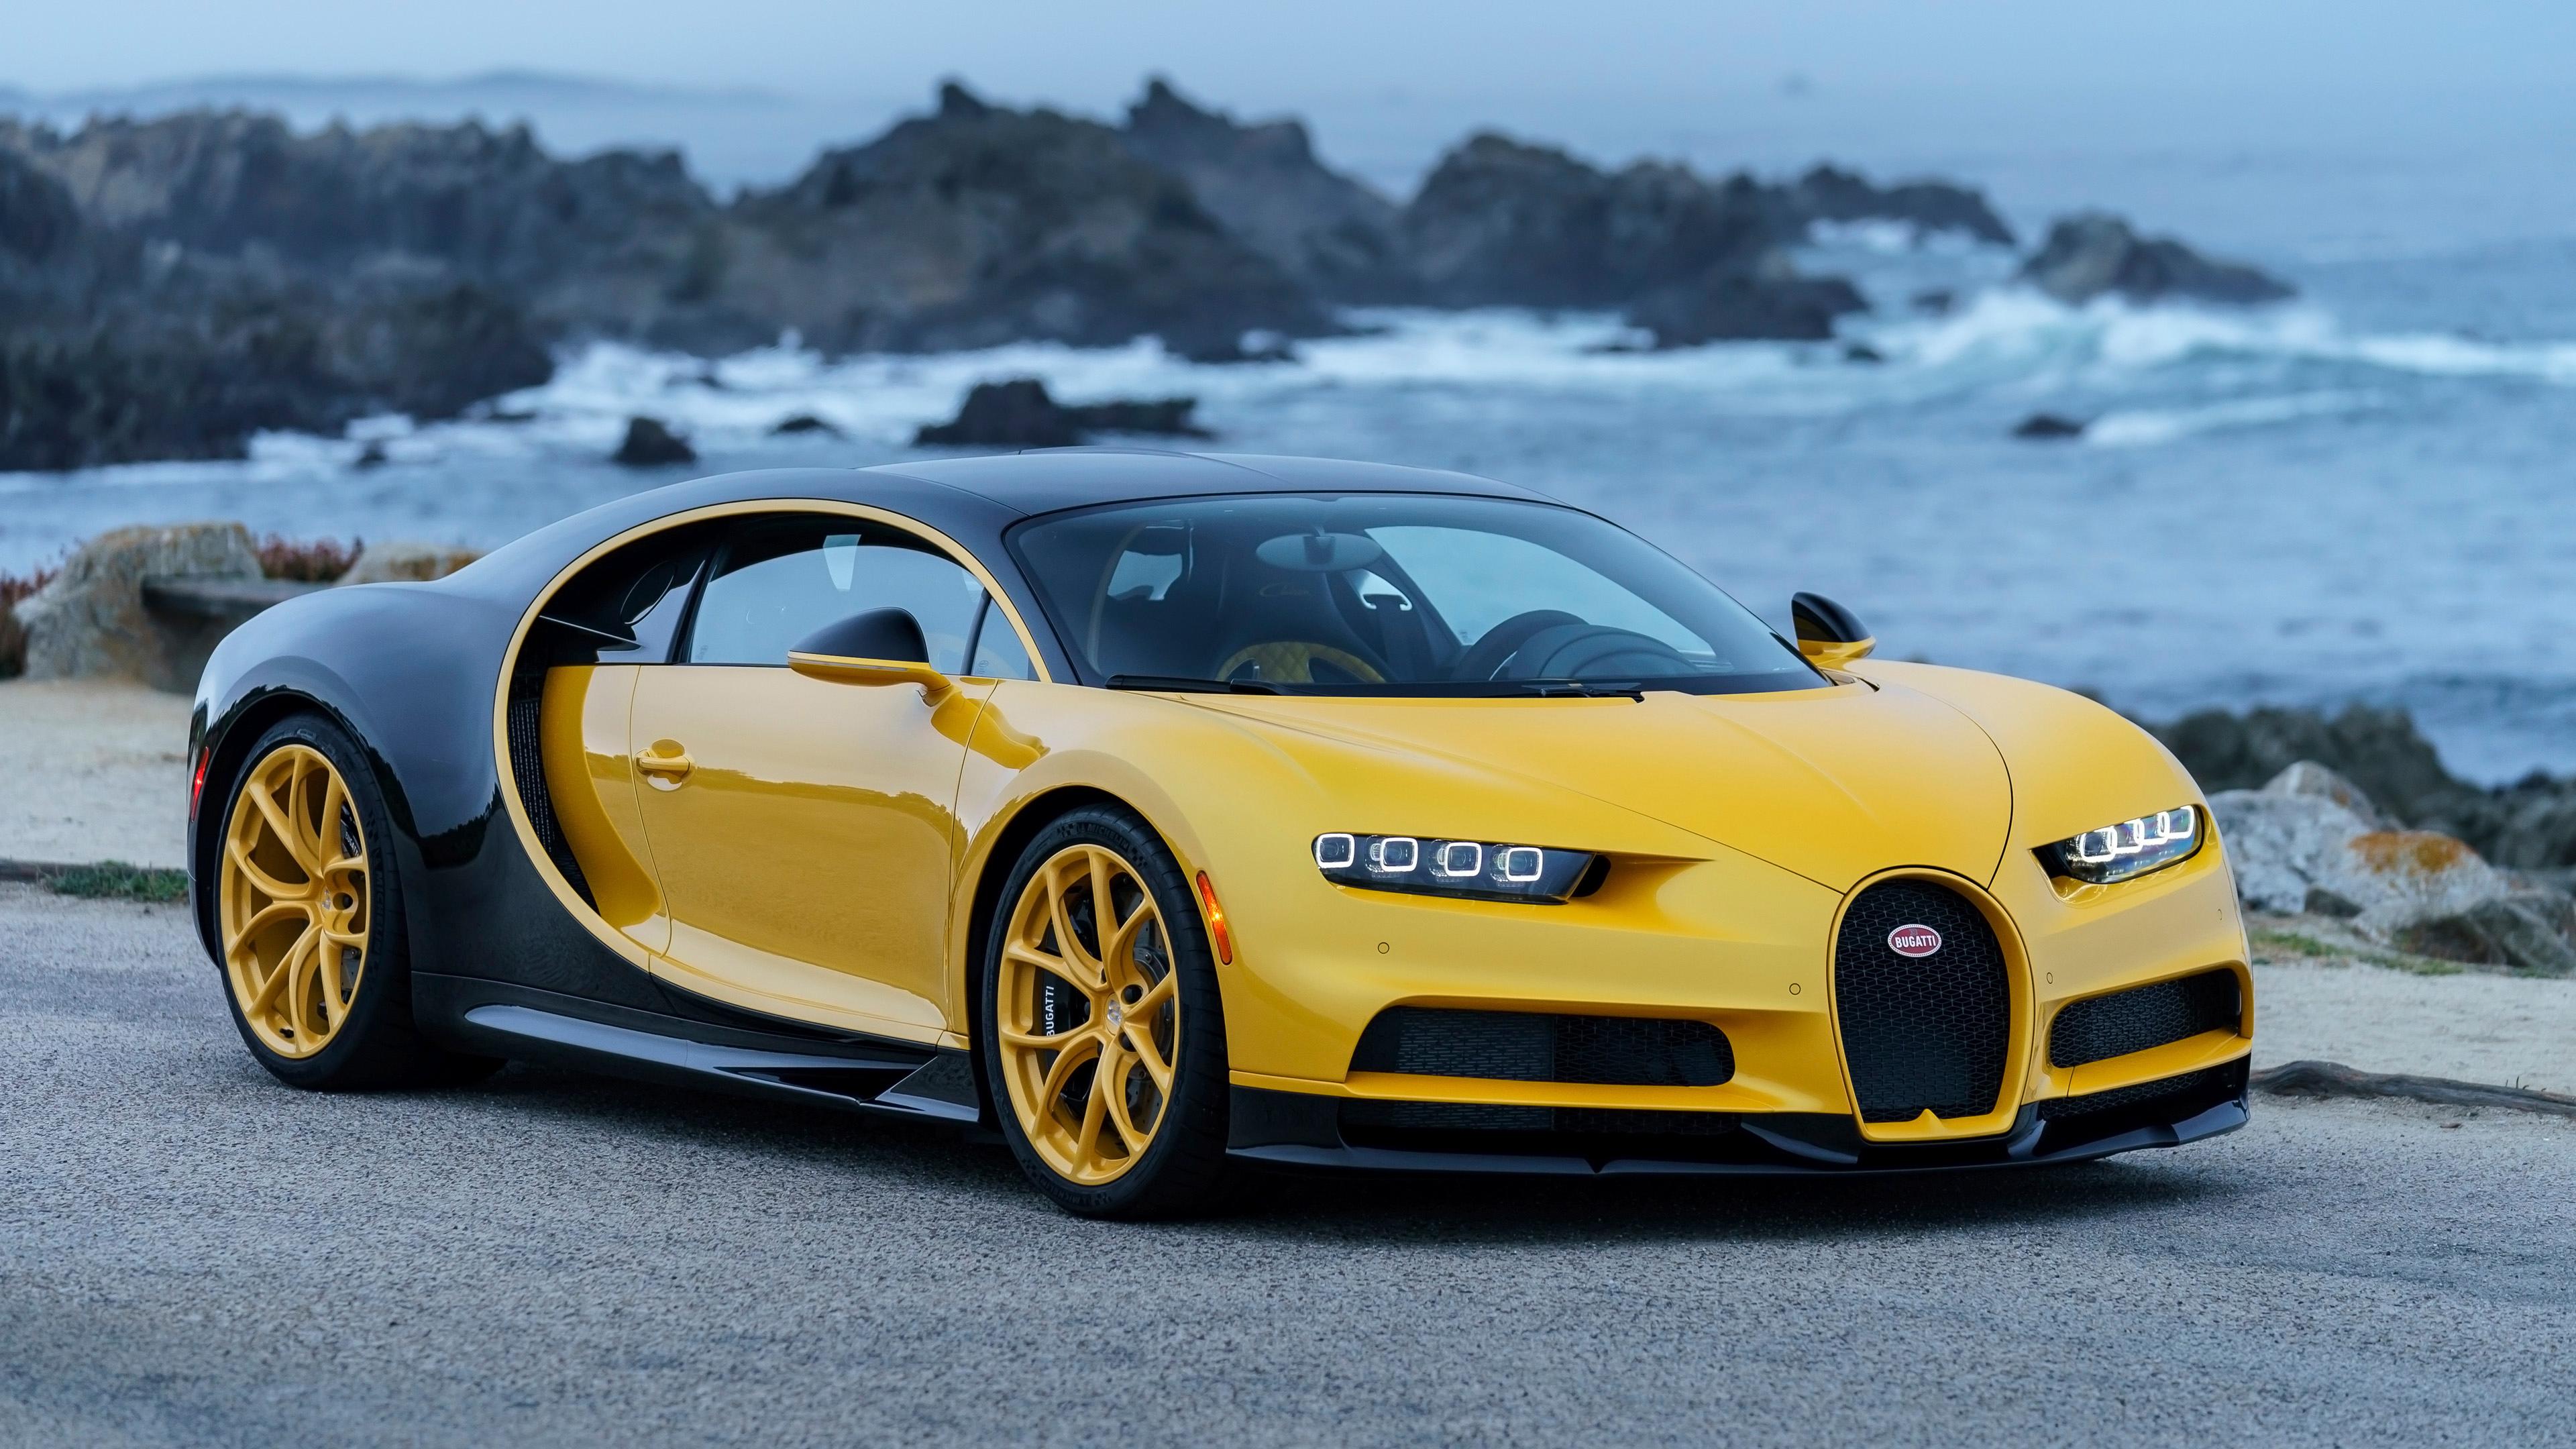 2018 Bugatti Chiron Yellow And Black 4k Wallpaper Hd Car